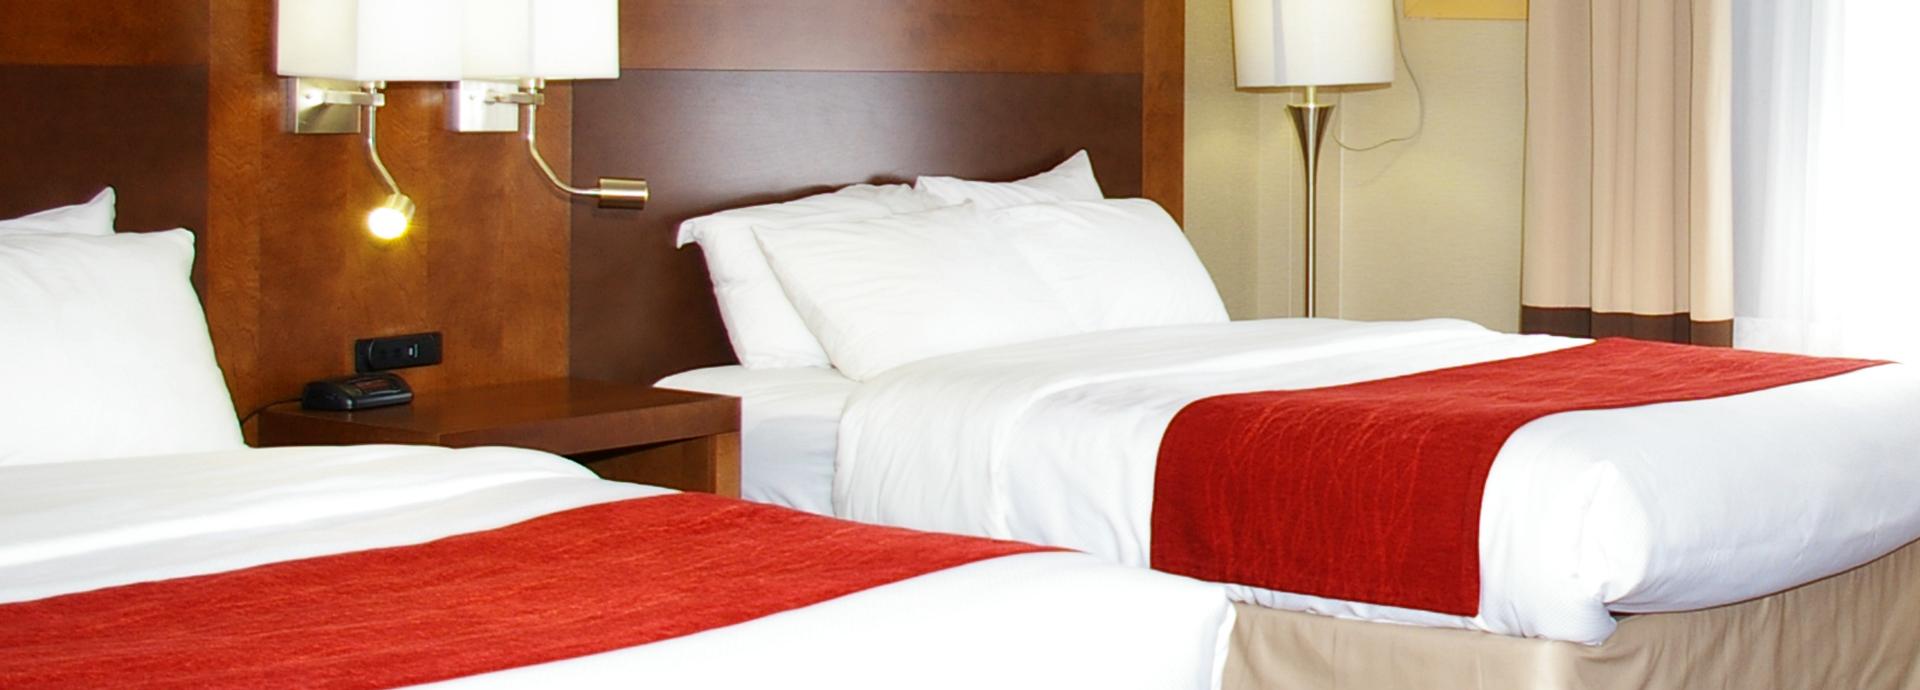 Hotel Comfort Inn Mont Laurier